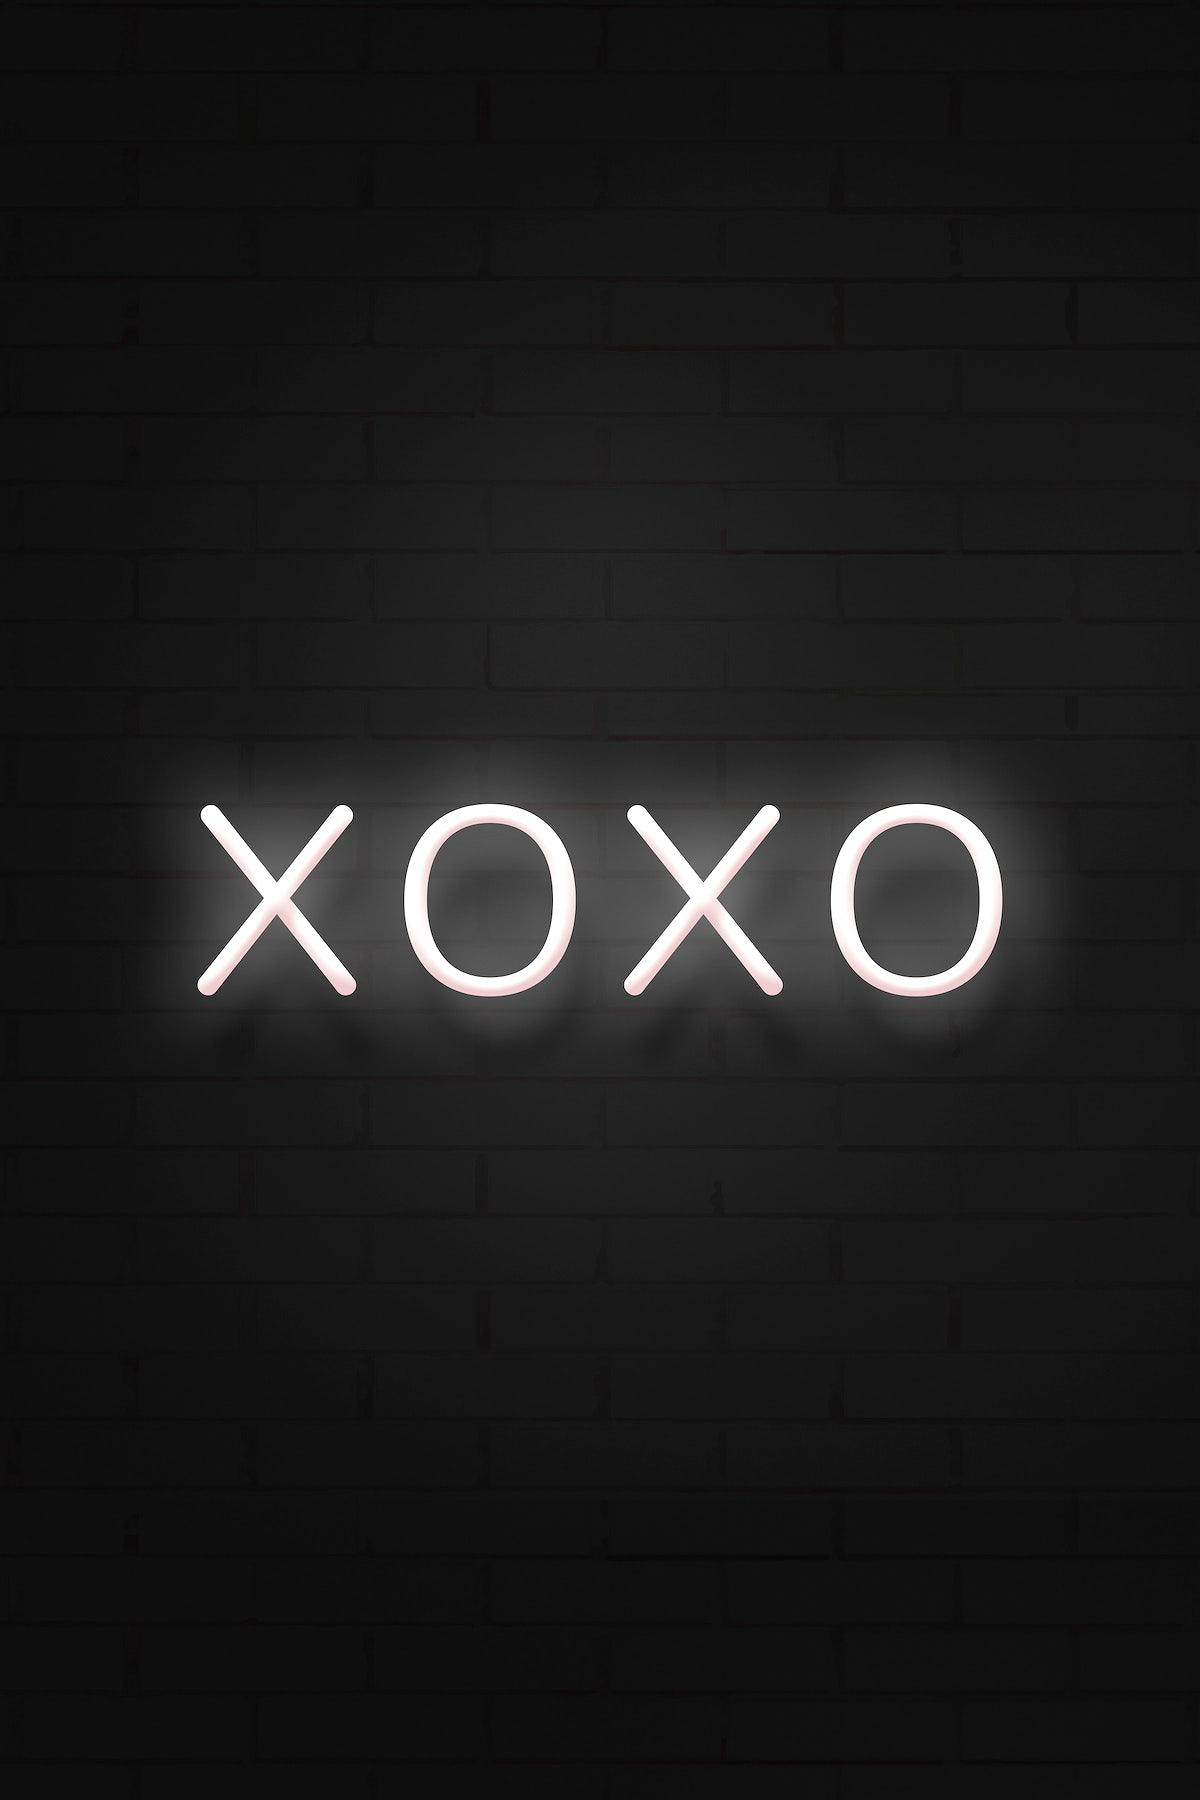 Black Aesthetic Images Neon Neon Glowing Black Aesthetic draw shelf